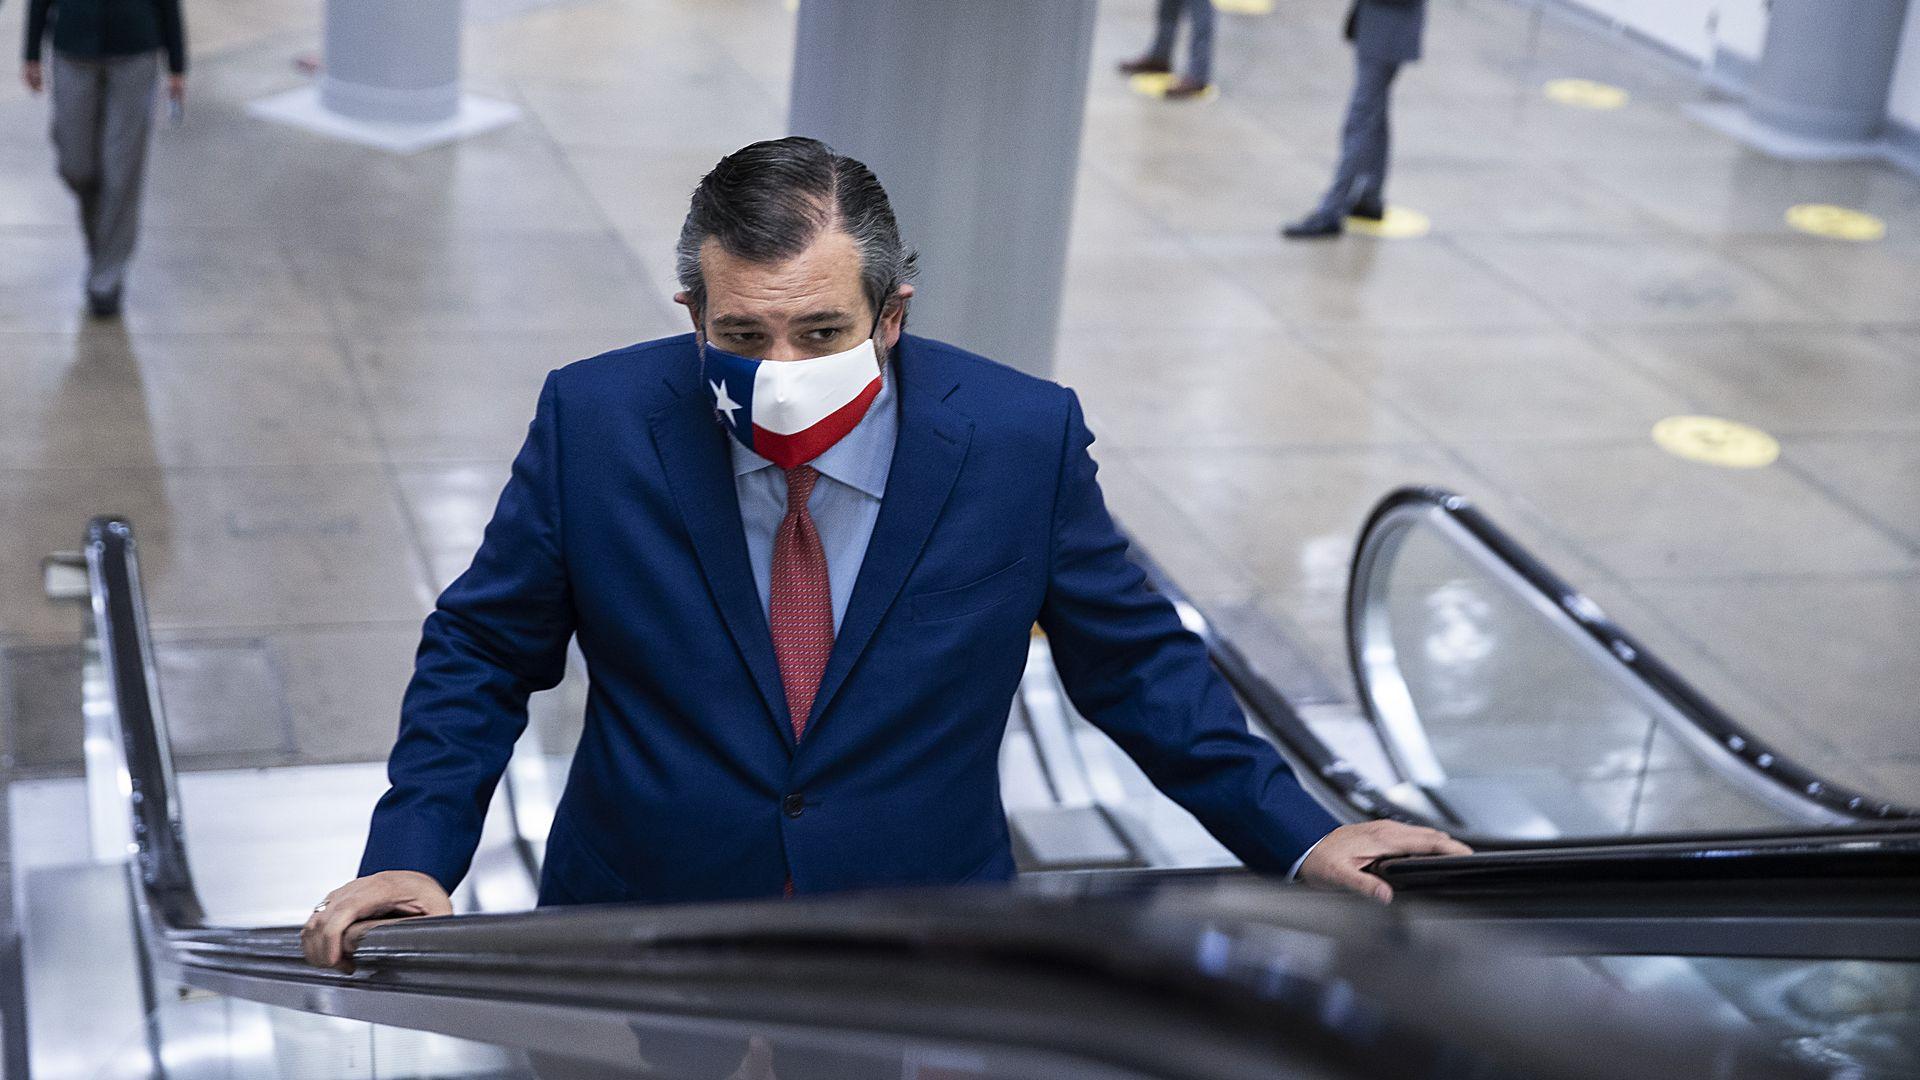 Senator Ted Cruz rides an escalator into the U.S. Capitol last month.